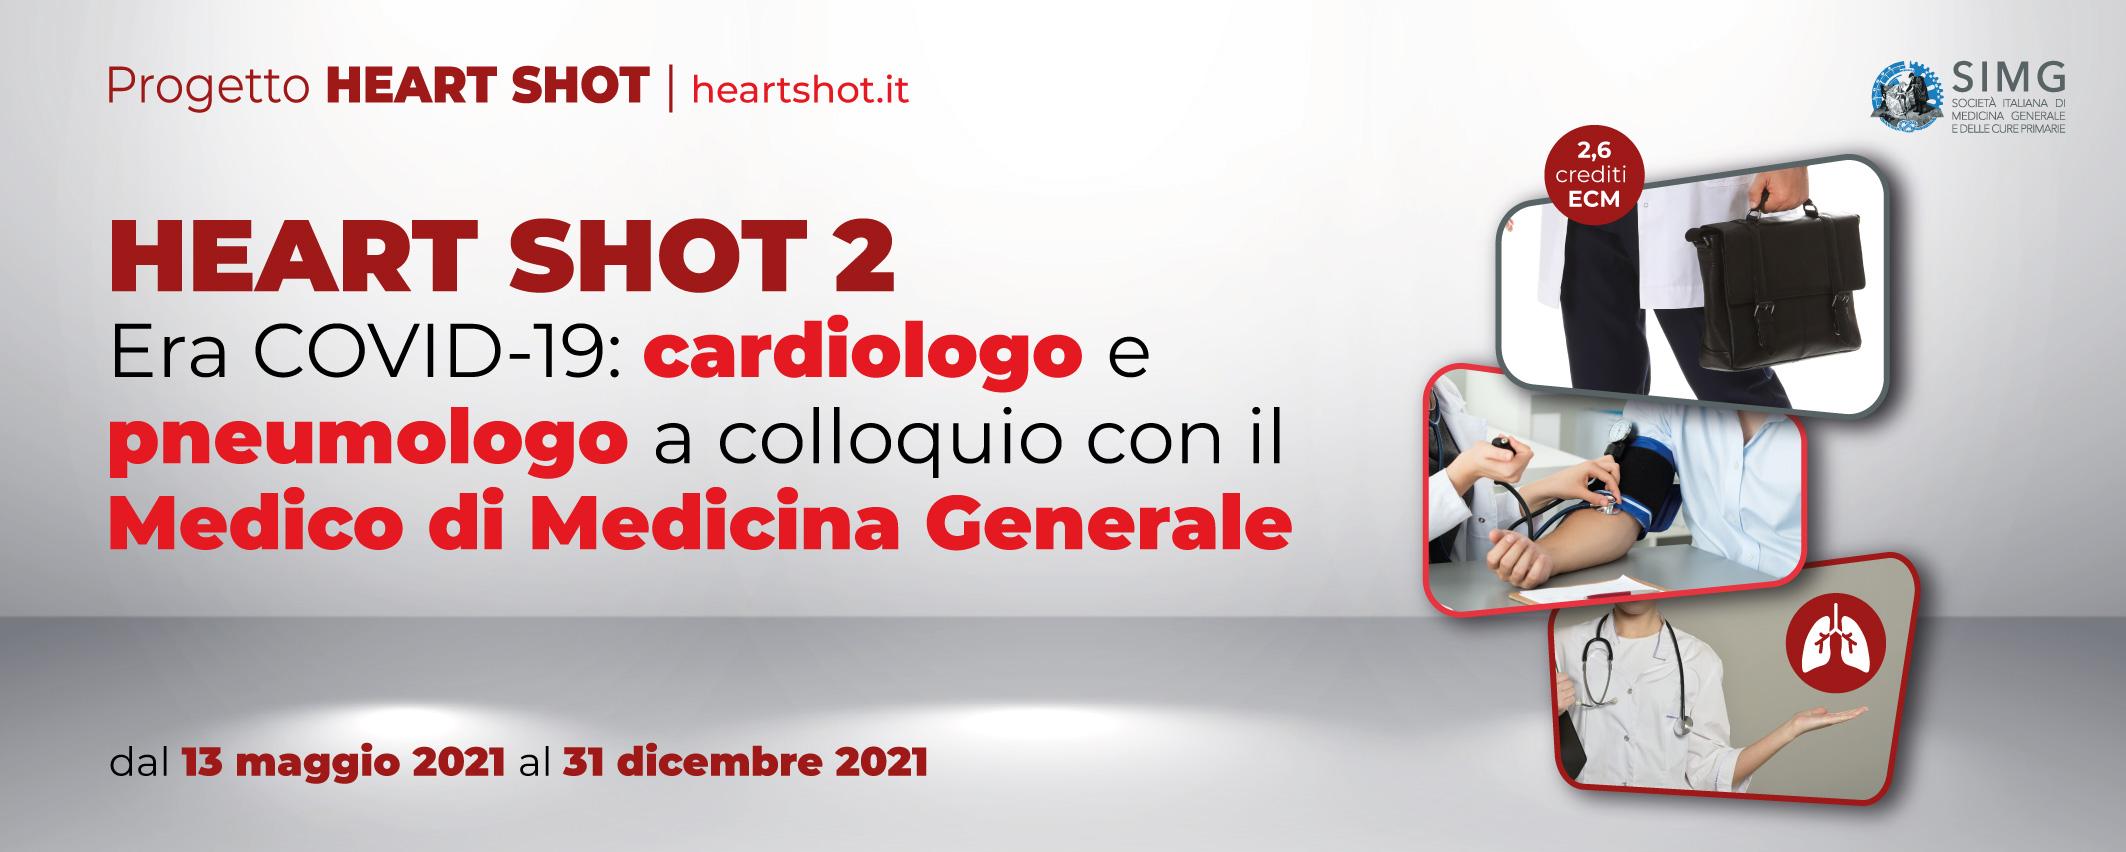 banner-heartshot-2